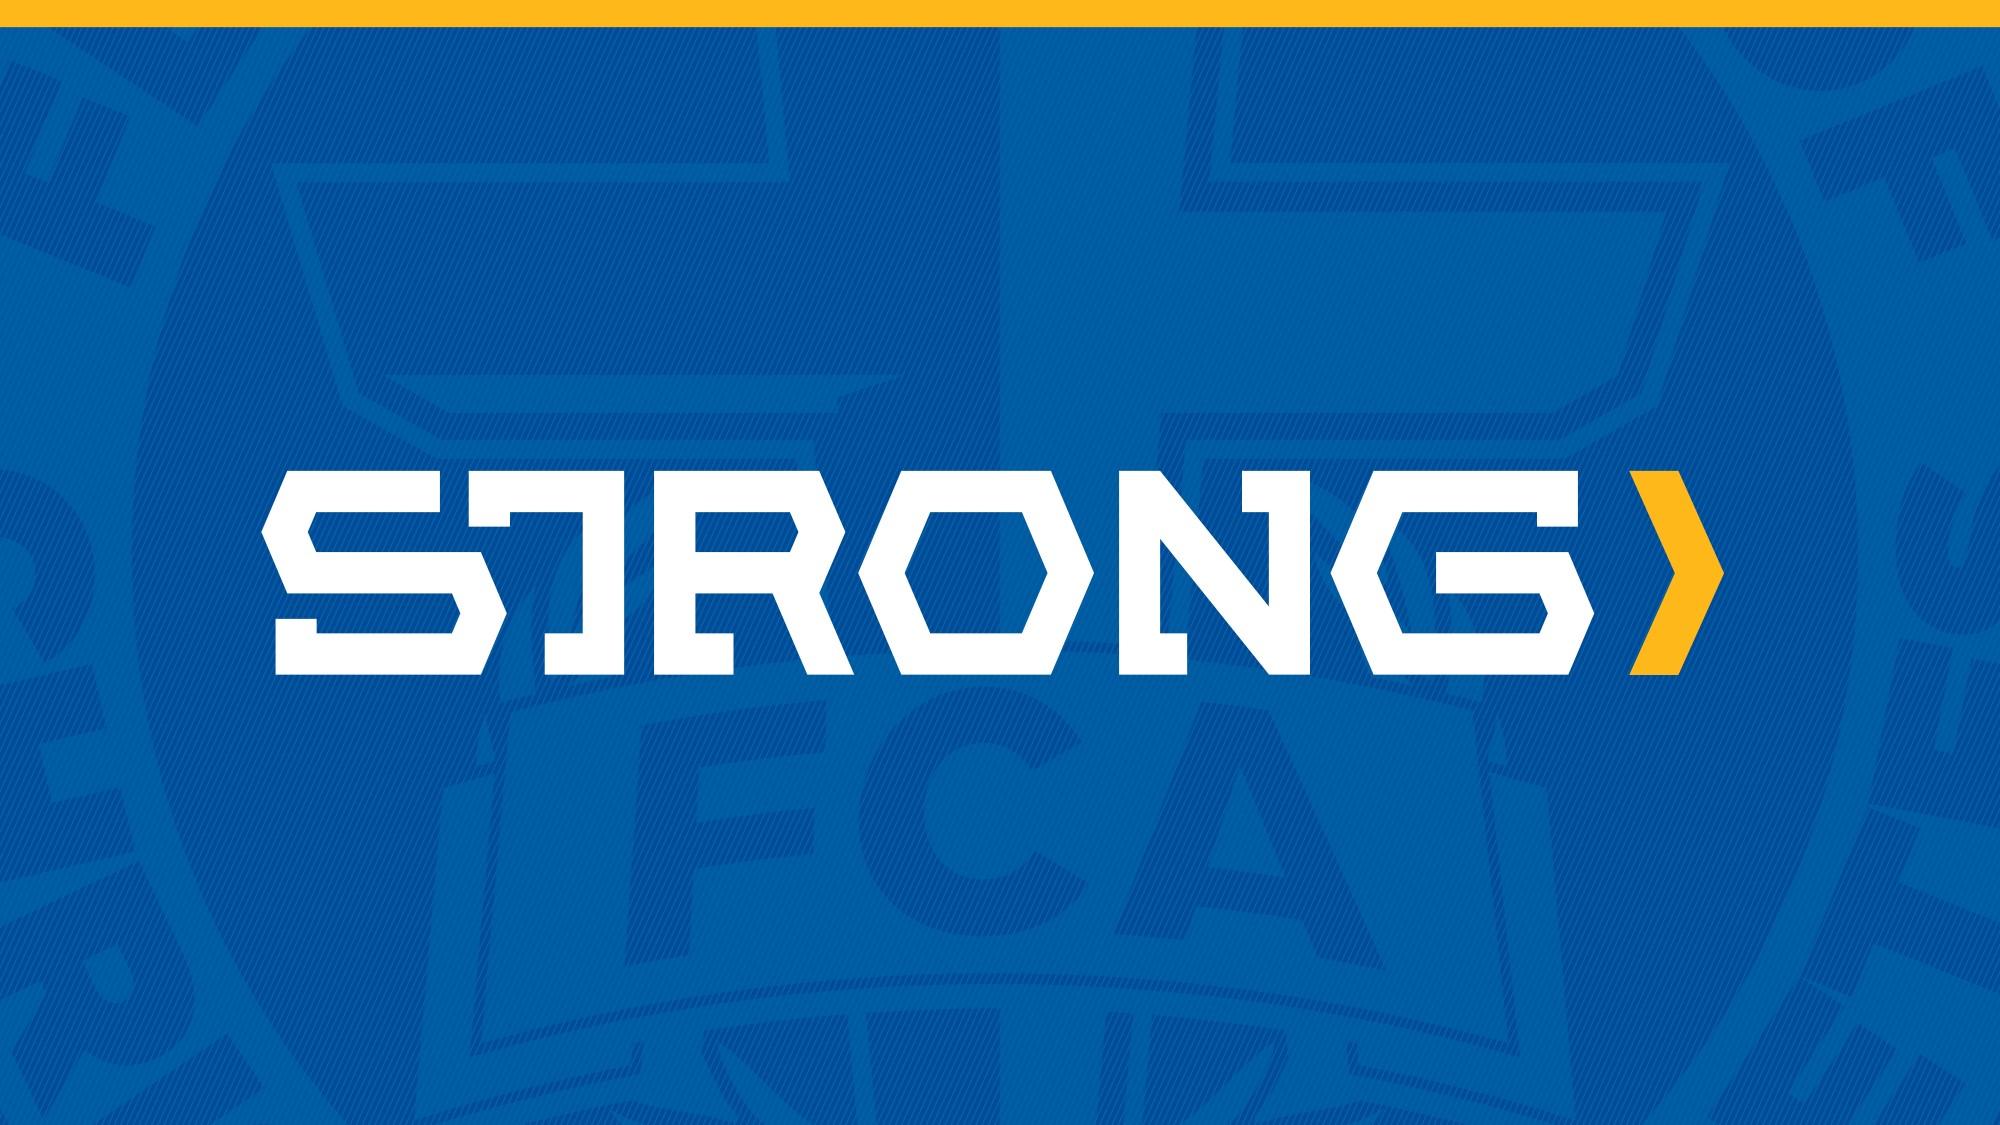 Ctsc 2018 strong logo